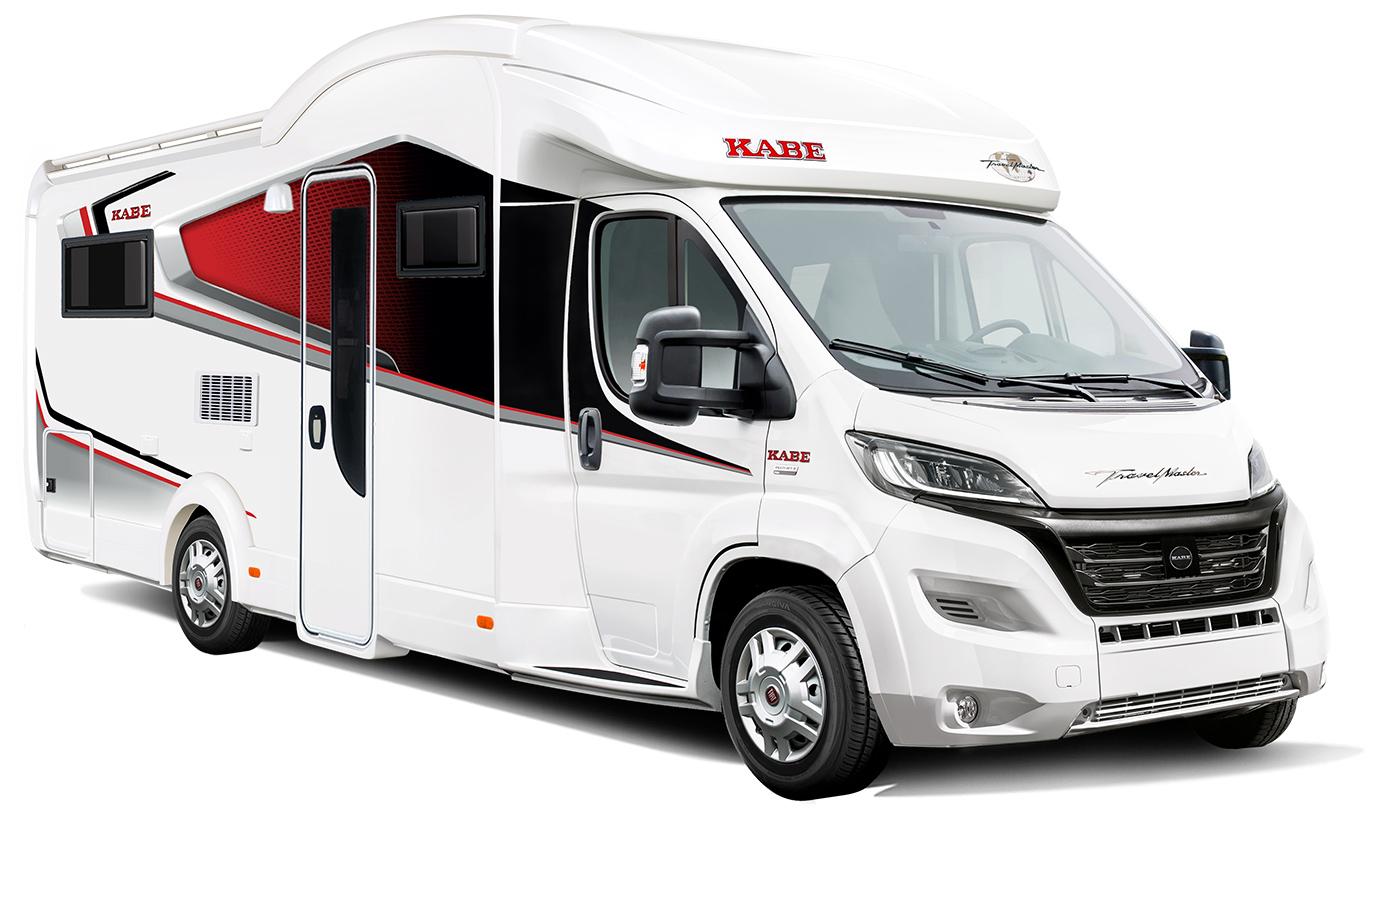 Kabe - Classic x740 LXL